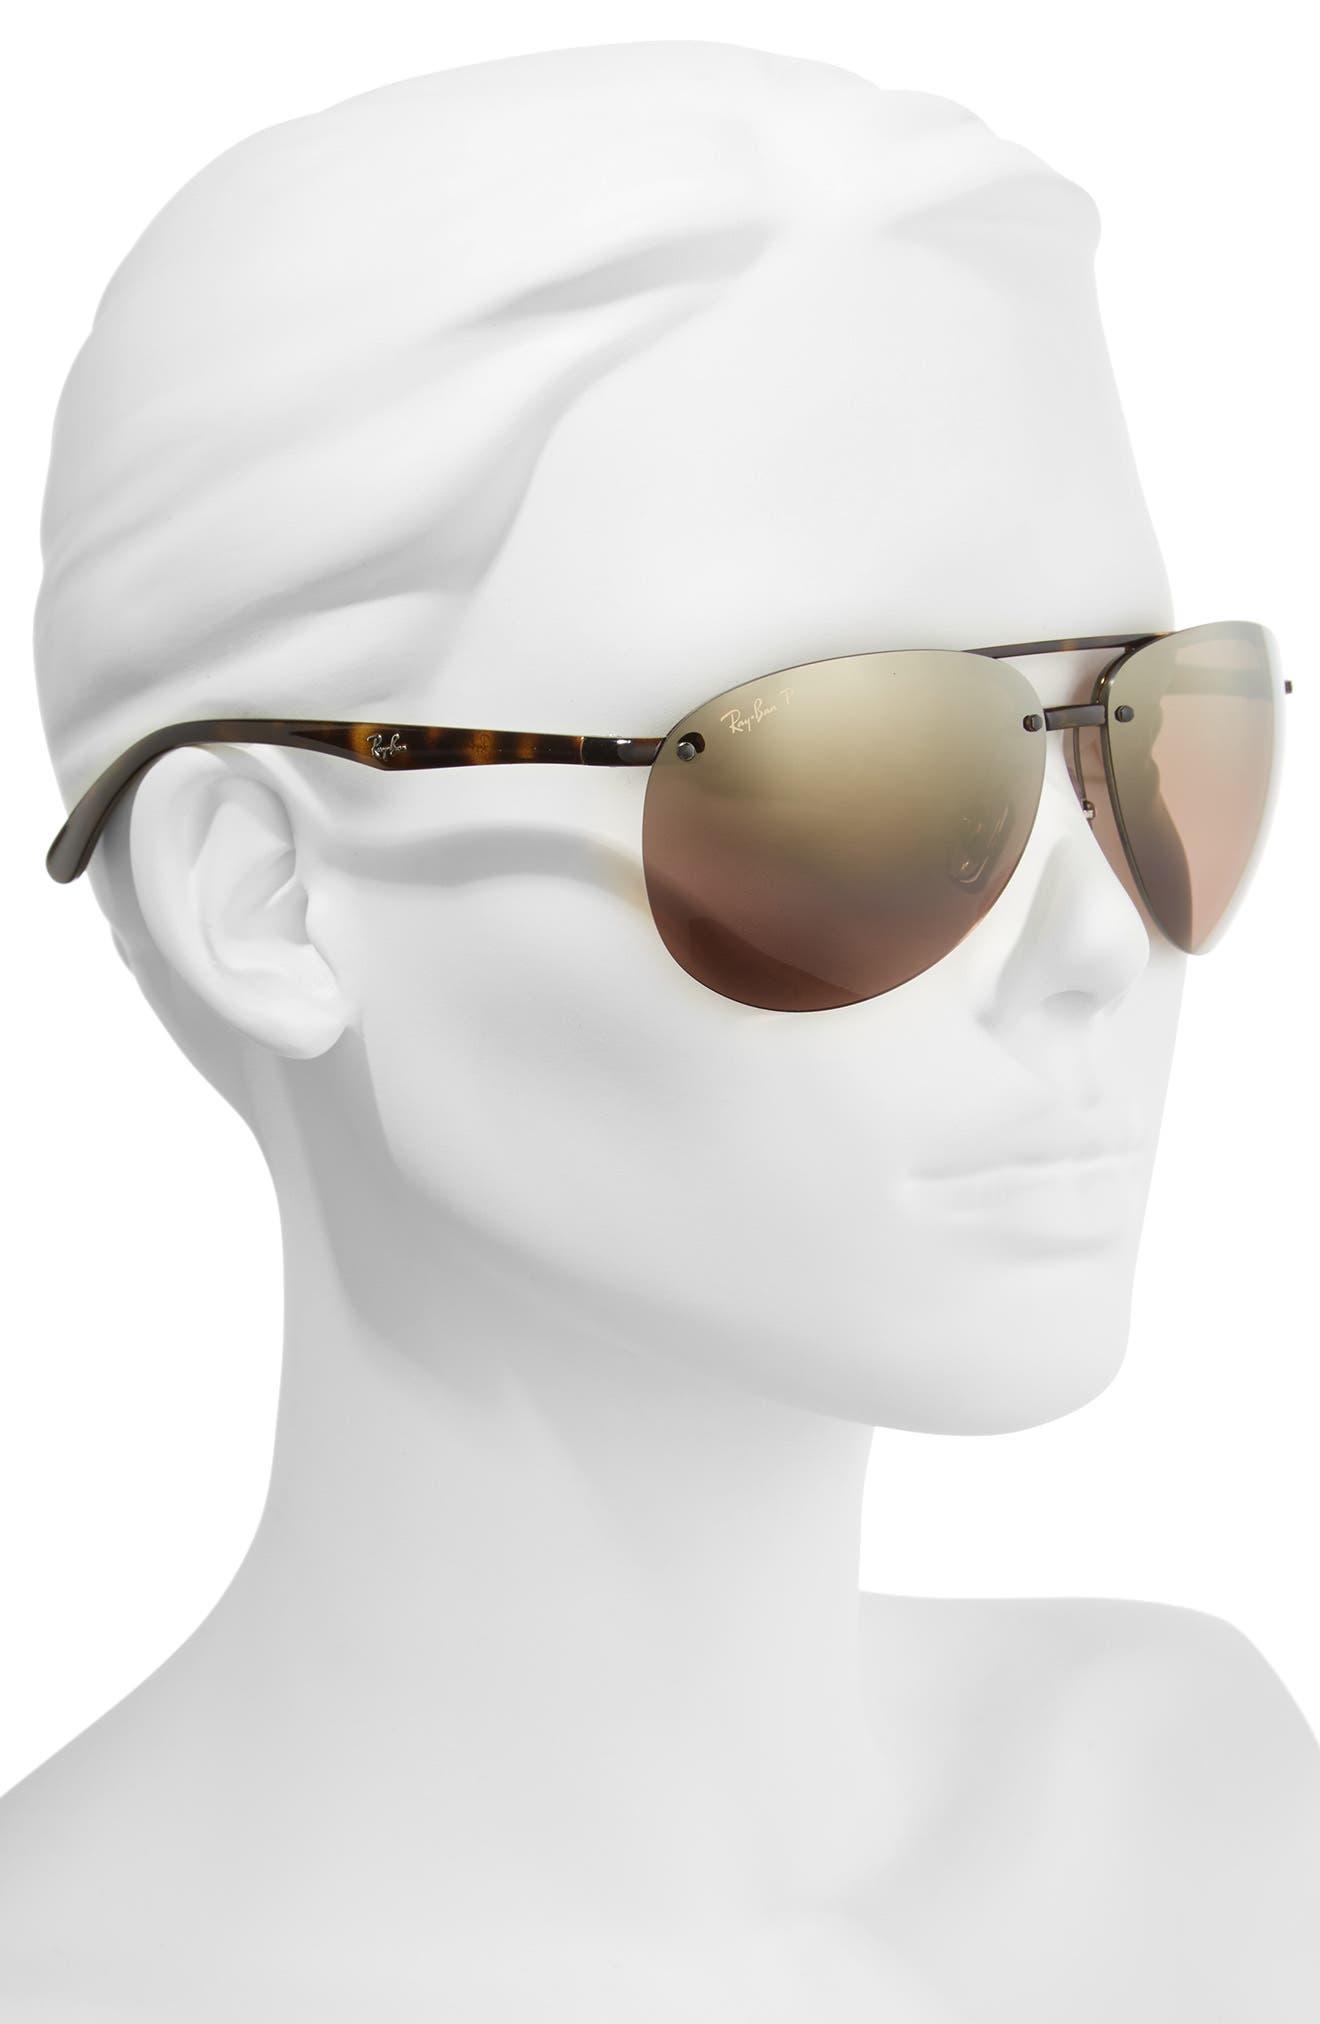 65mm Gradient Aviator Sunglasses,                             Alternate thumbnail 2, color,                             Havana